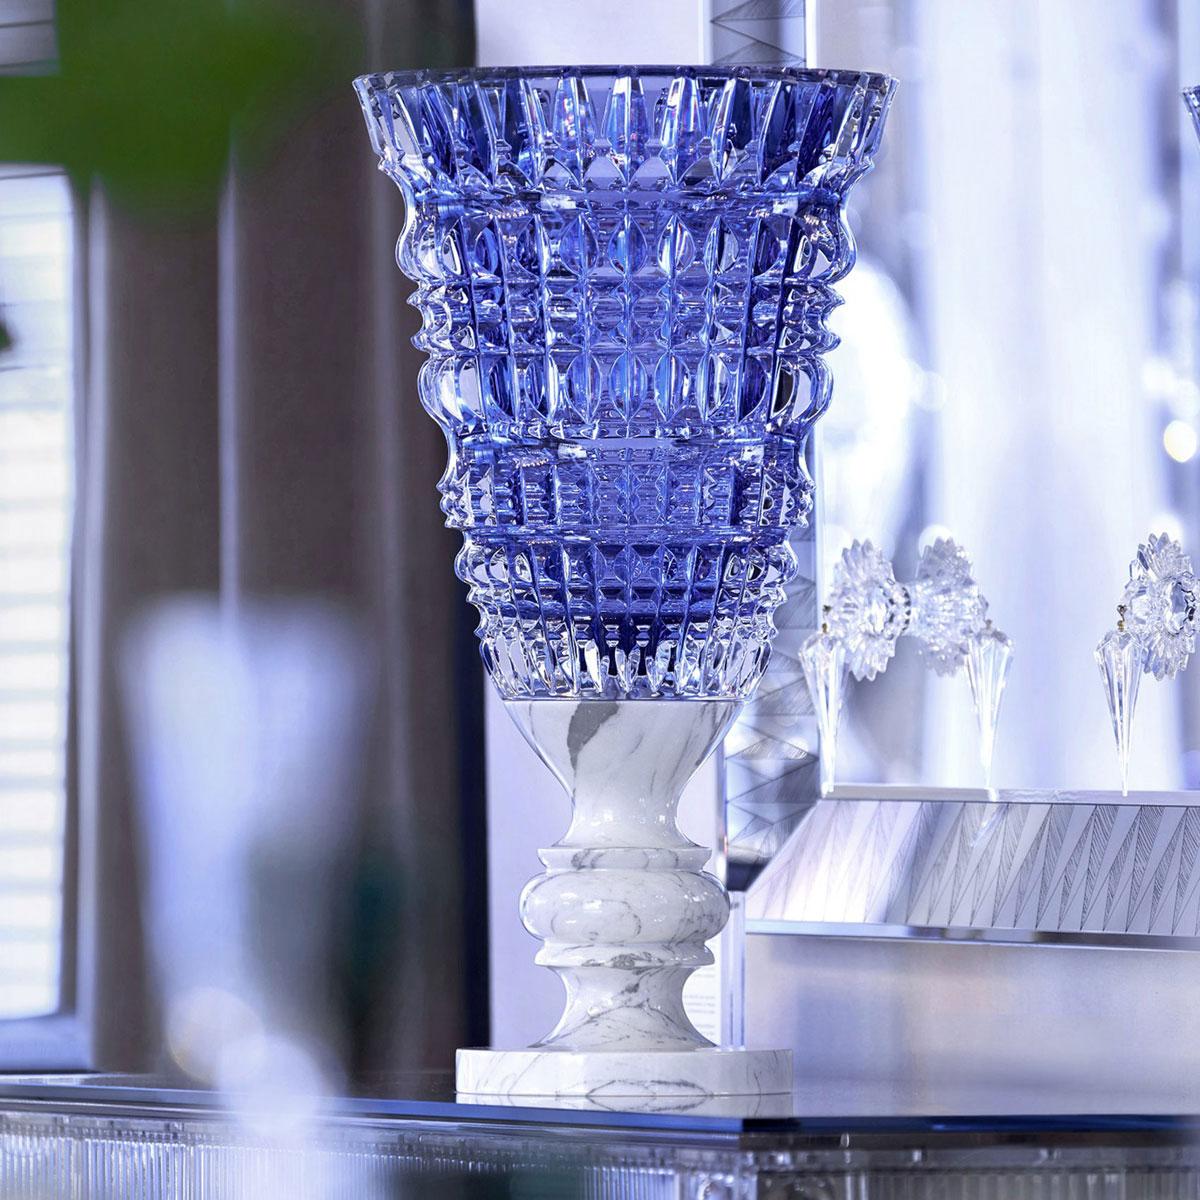 Baccarat Crystal, New Antique Blue Crystal Vase, Limited Edition